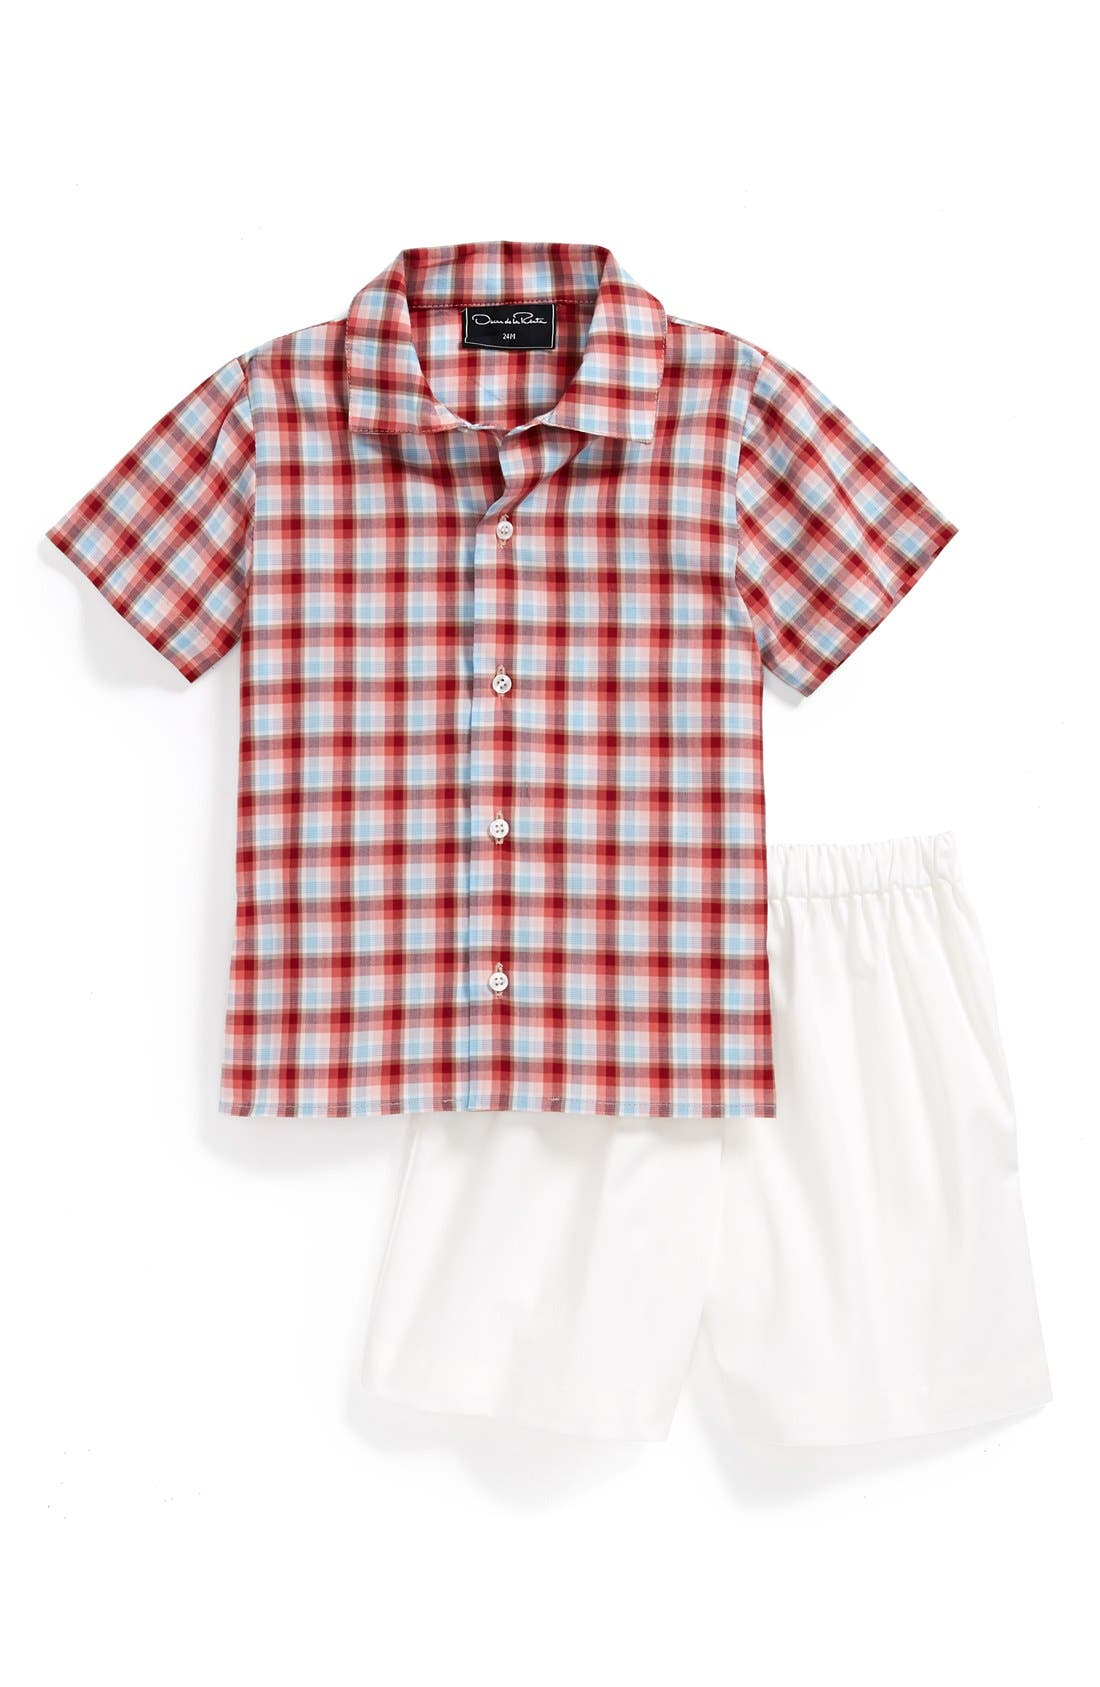 Main Image - Oscar de la Renta Woven Shirt and Shorts (Baby Boys)